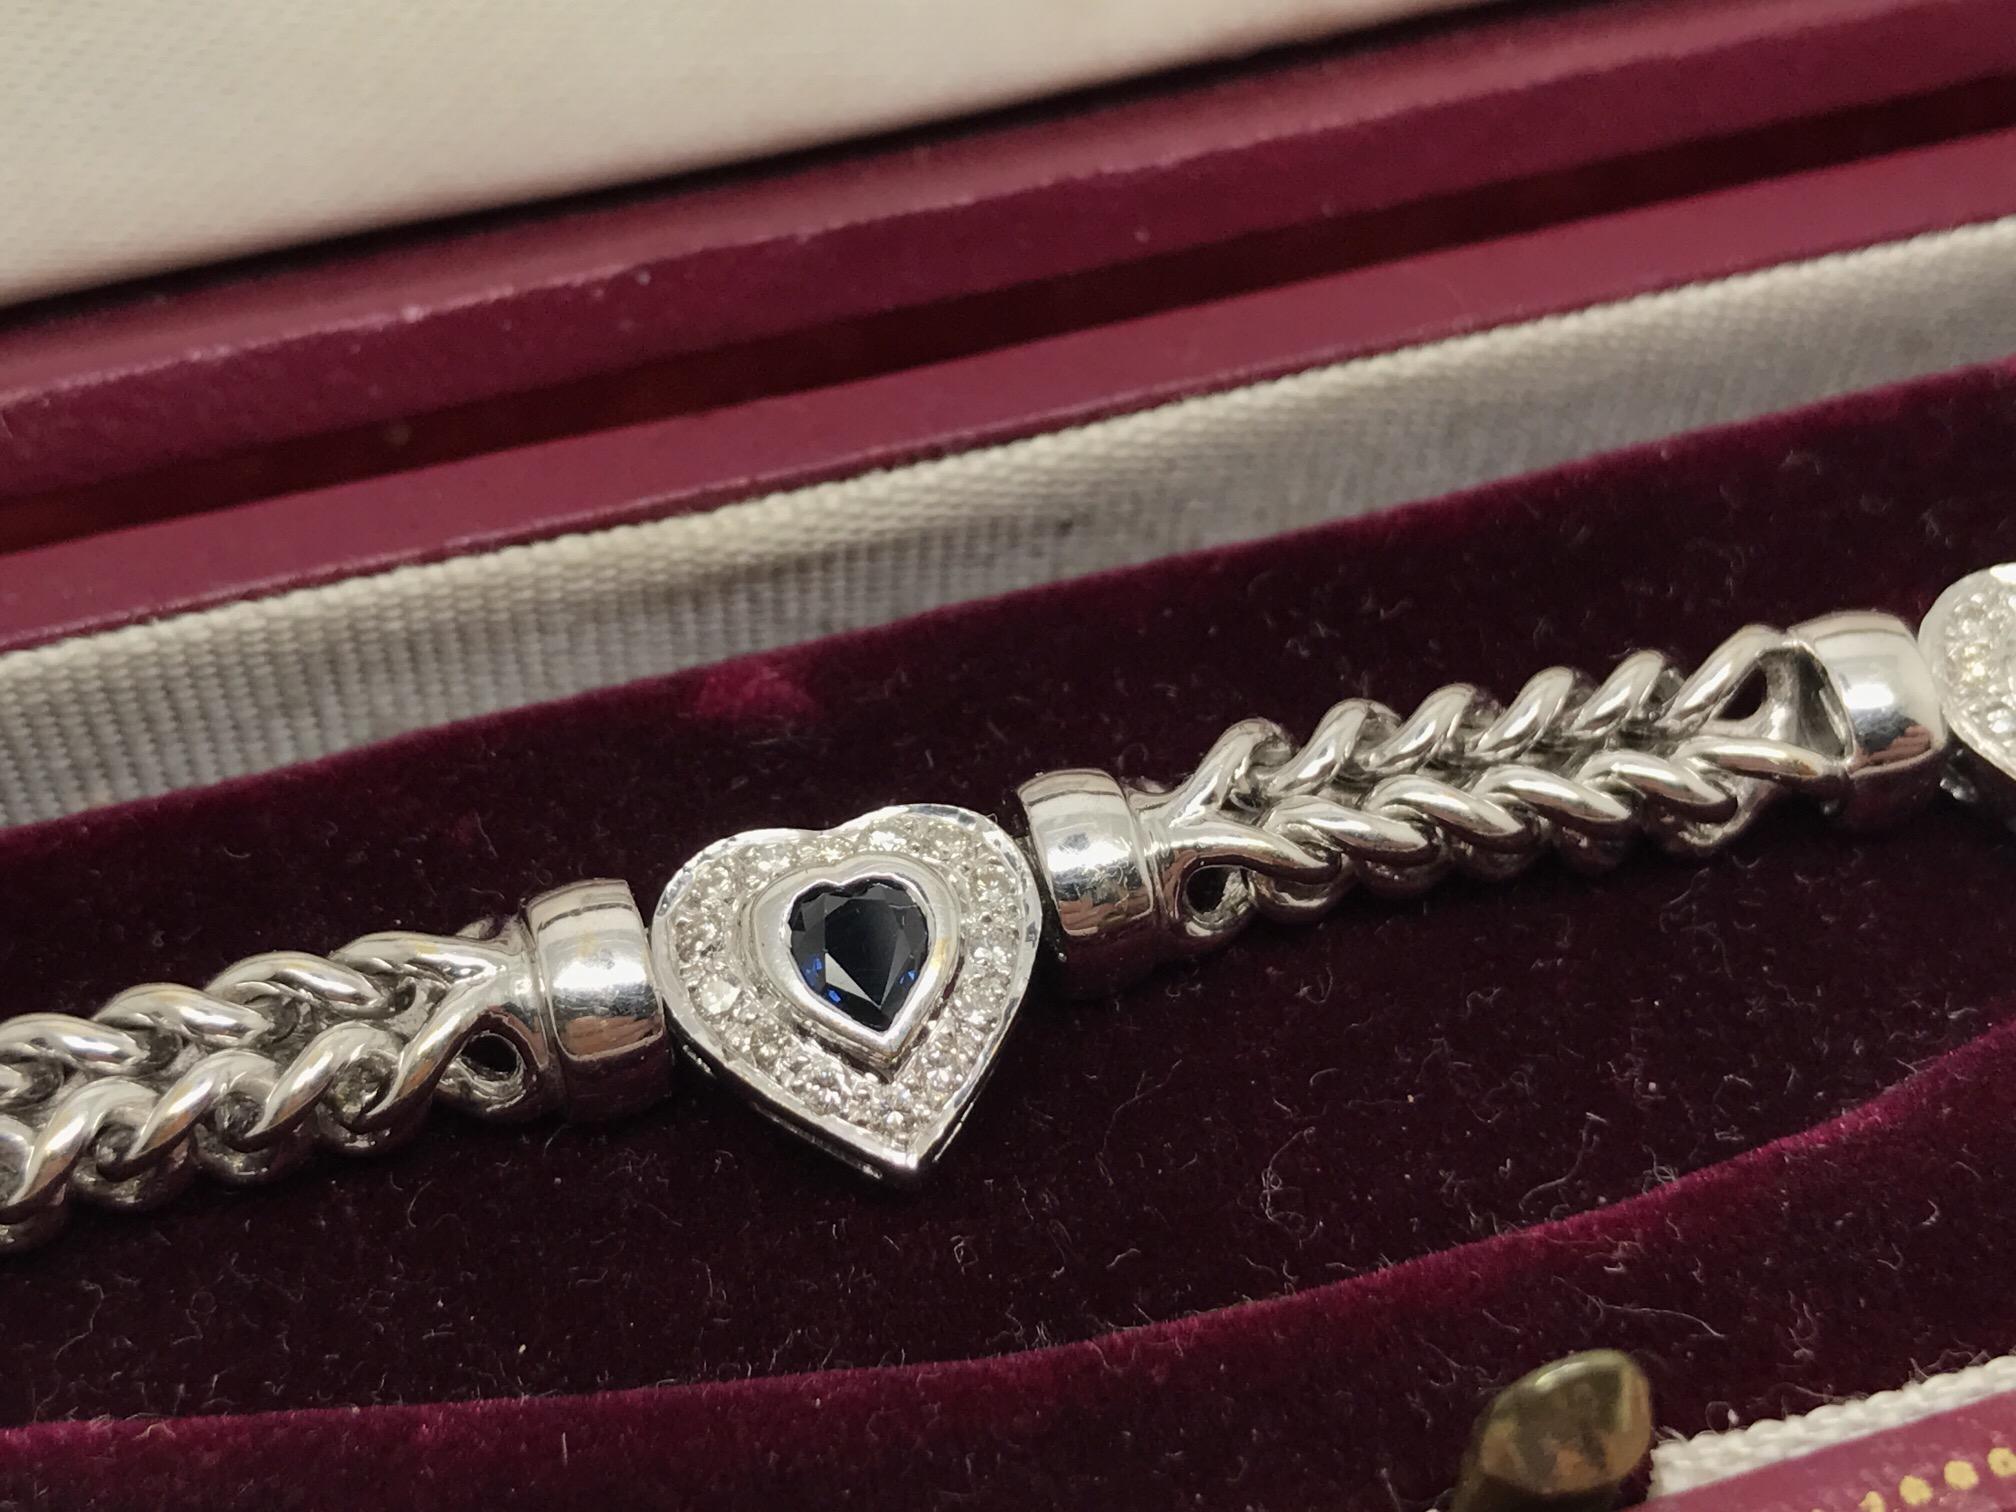 Lot 37 - FINE QUALITY 18ct WHITE GOLD HEART BLUE SAPPHIRE & DIAMOND BRACELET APPROX 35 GRAMS